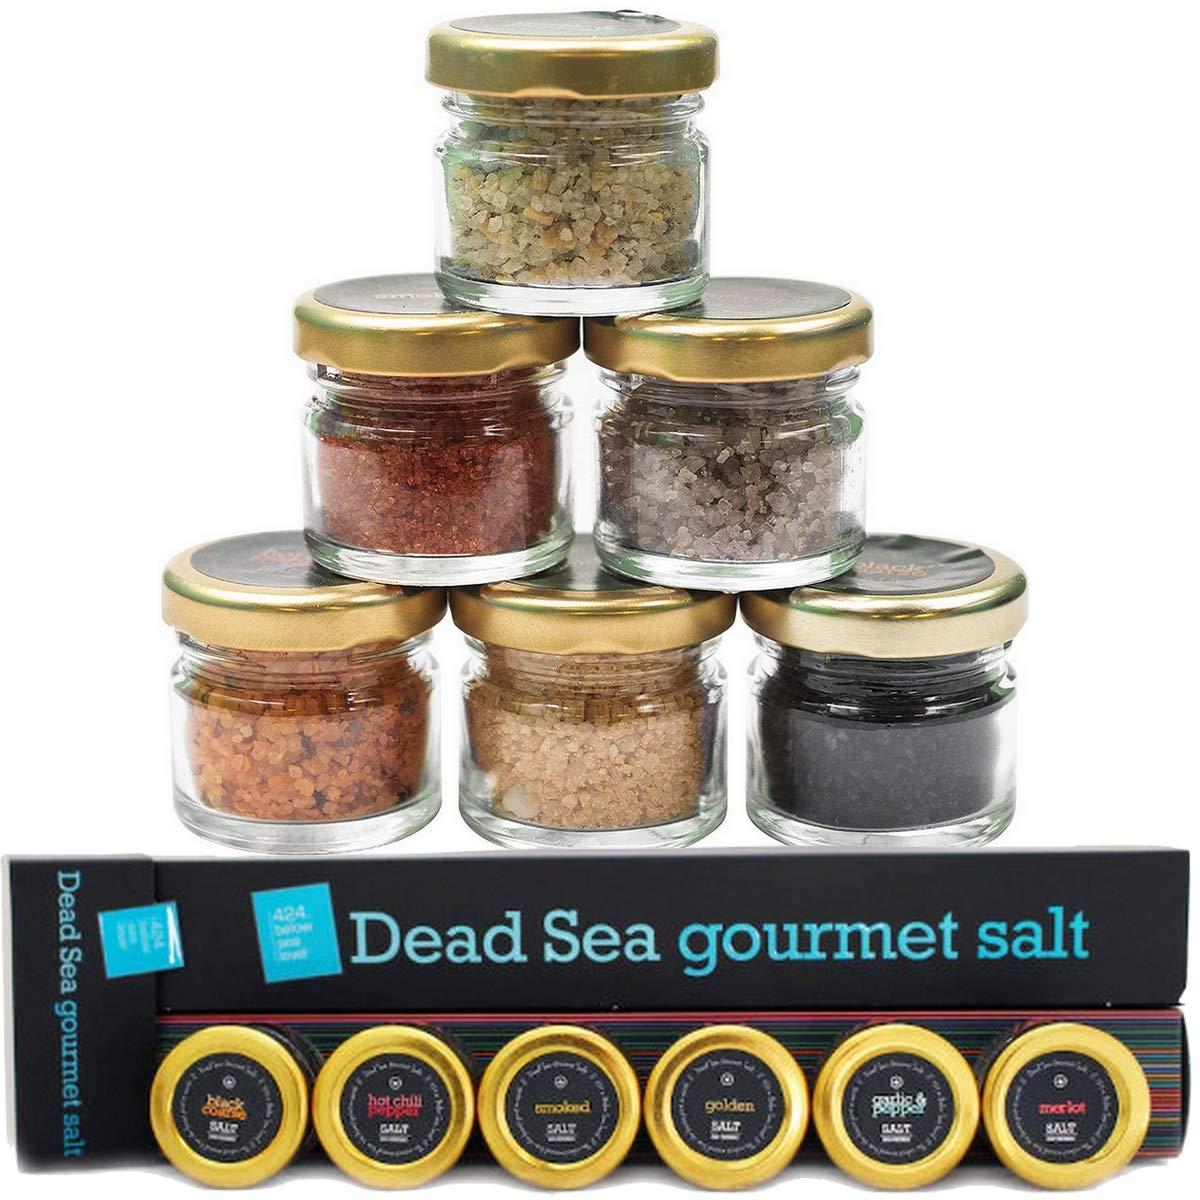 424's Natural Organic Dead Sea Salt - 6 Pack Gift set - Black Coarse Salt, Hot Chili Pepper Salt, Garlic and Pepper, Golden, Smoked and Diamond Salt – No Additives – Kosher Salt - Vegan - 6X0.88 oz.